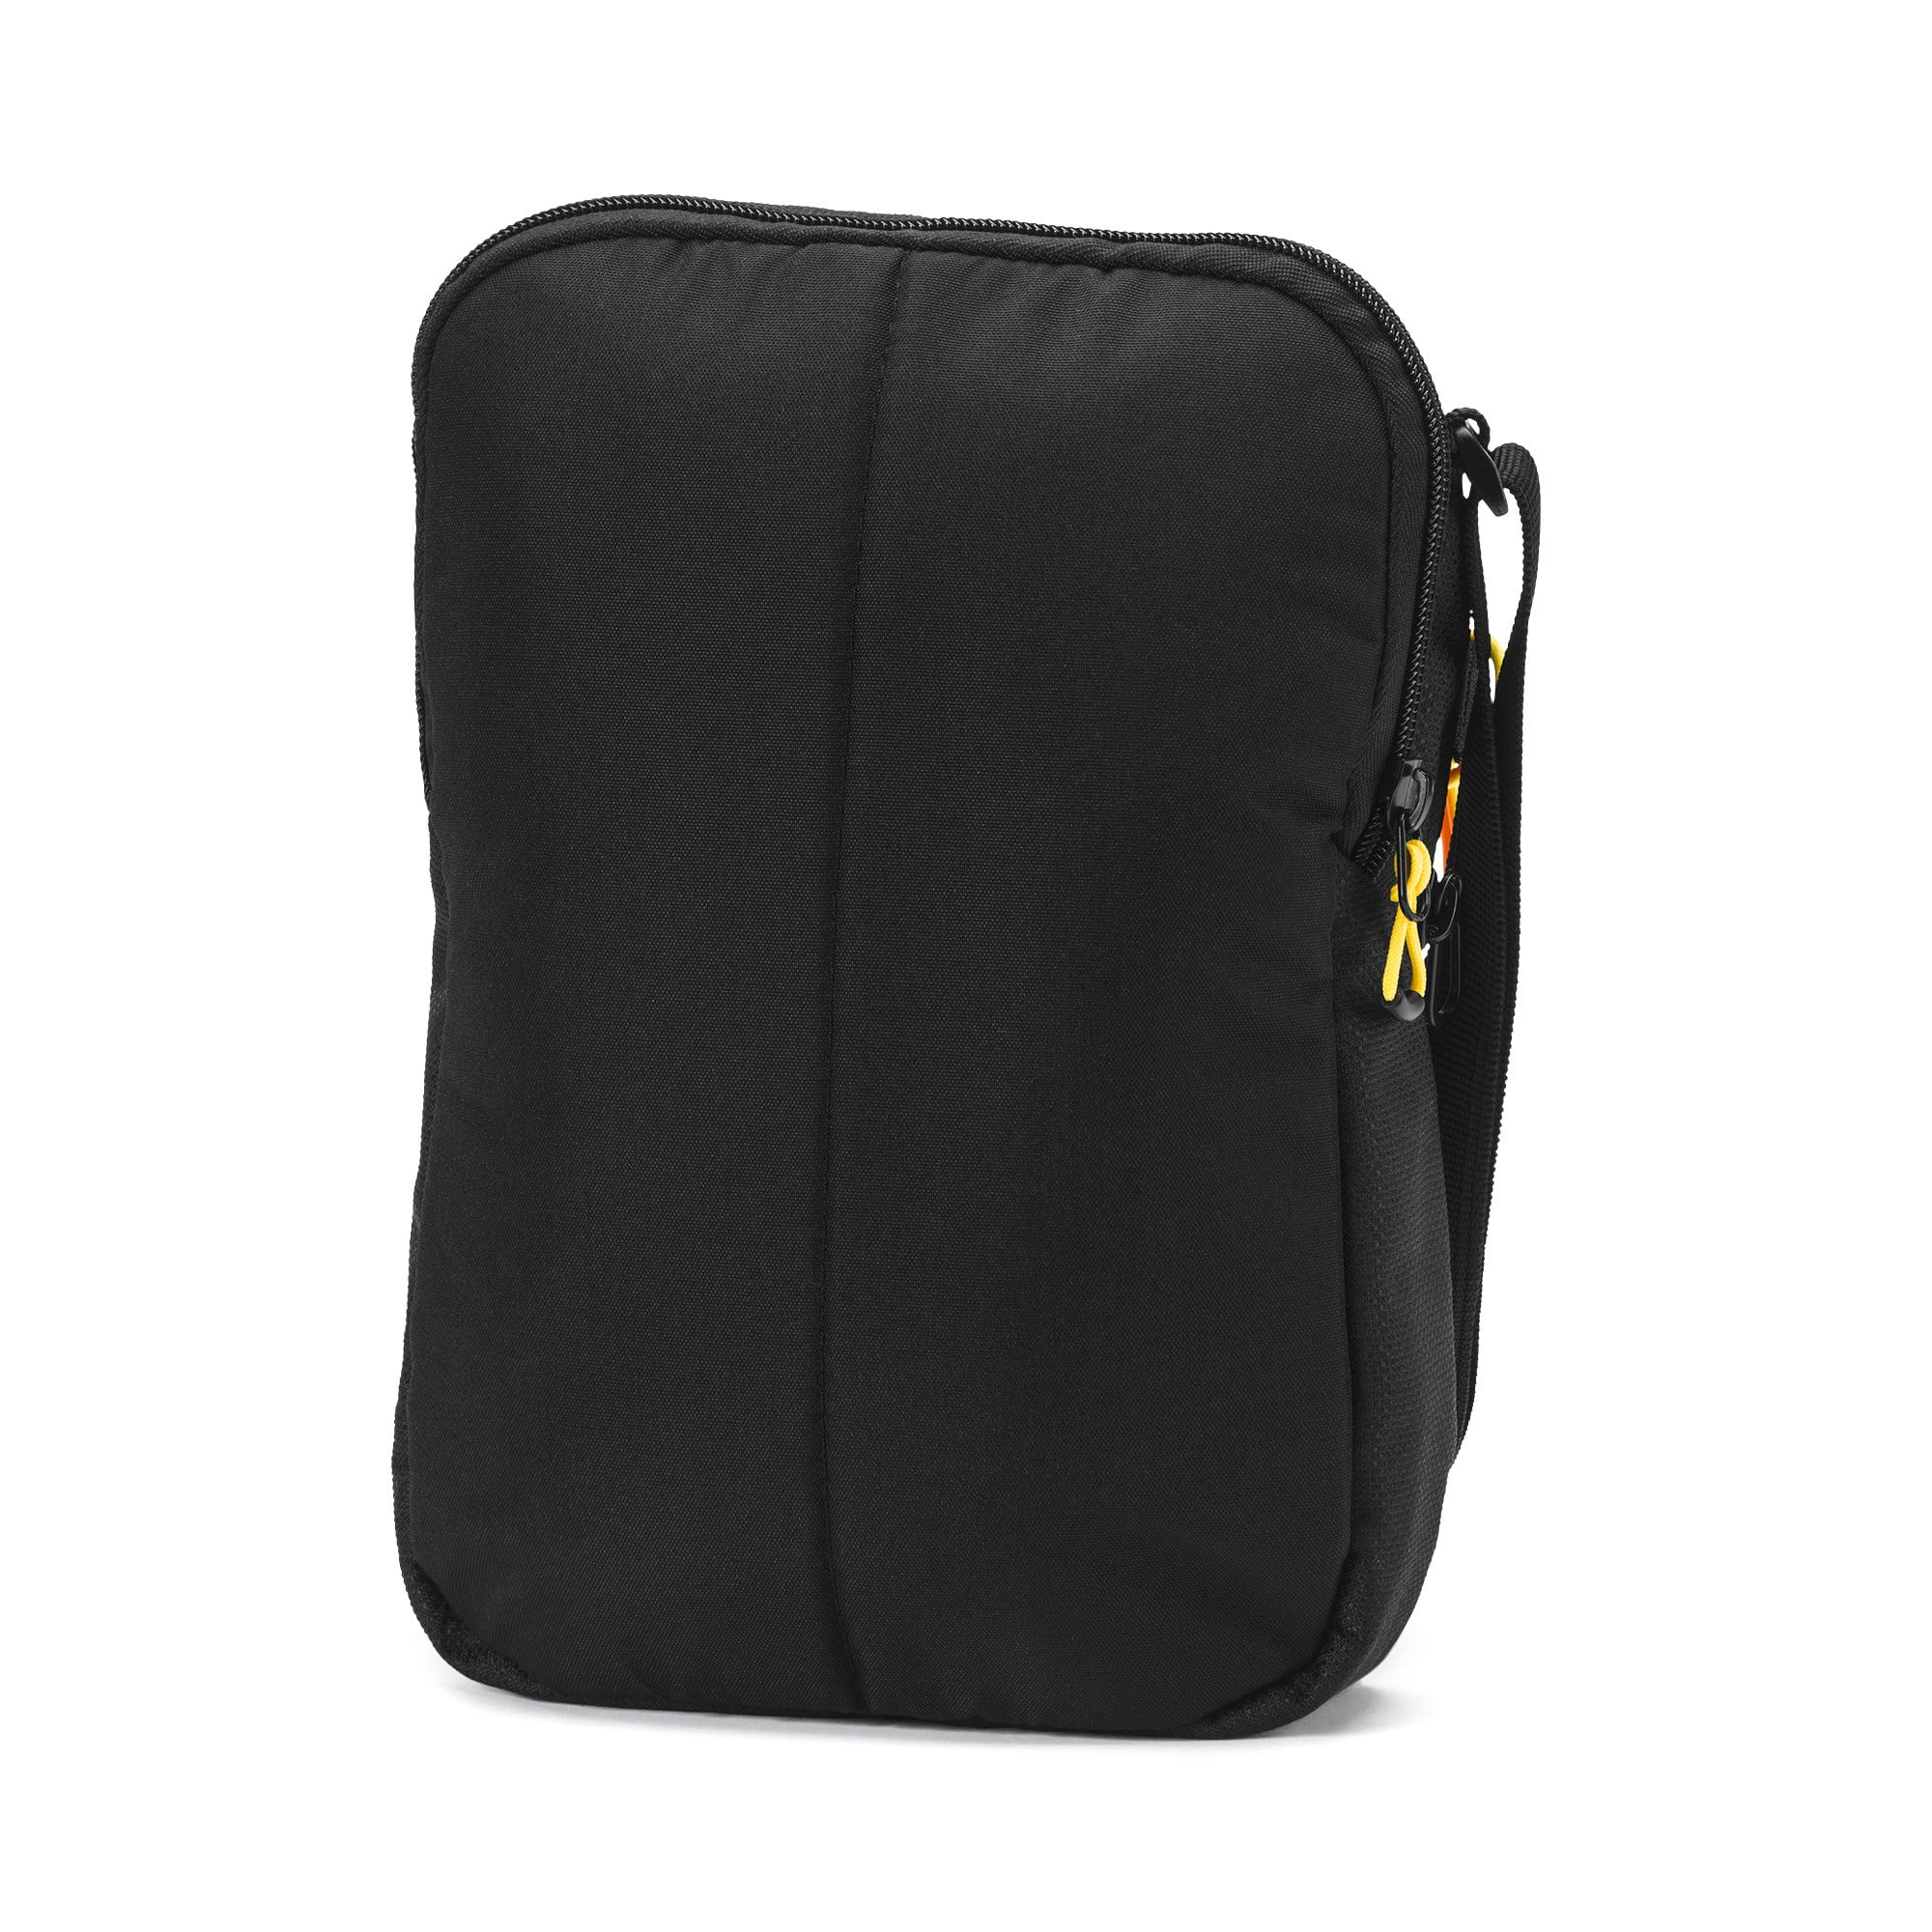 Thumbnail 2 of Scuderia Ferrari Fanwear Portable Bag, Puma Black, medium